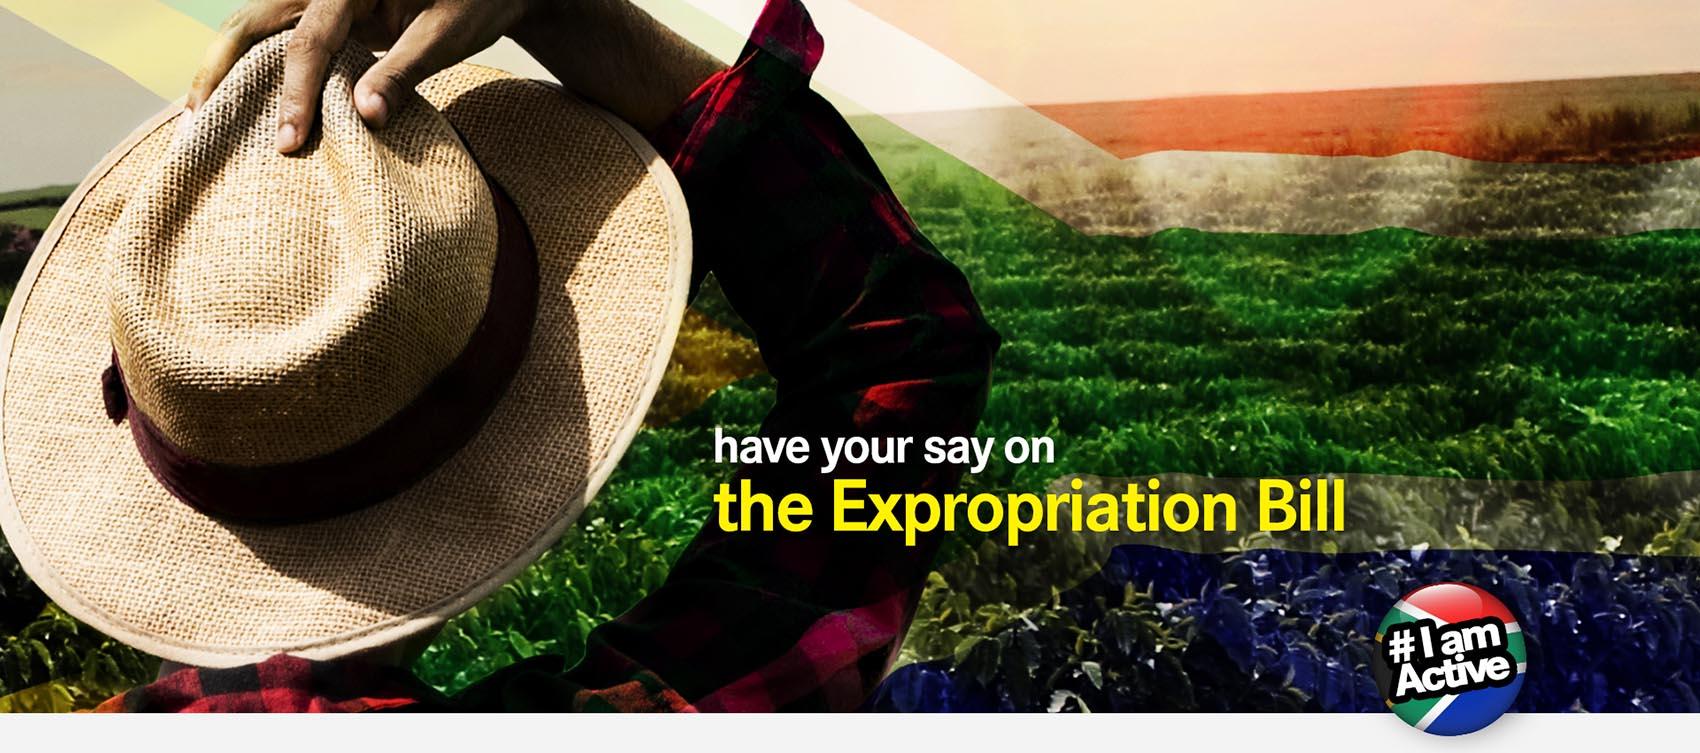 DearSA-Expropriation -Bill